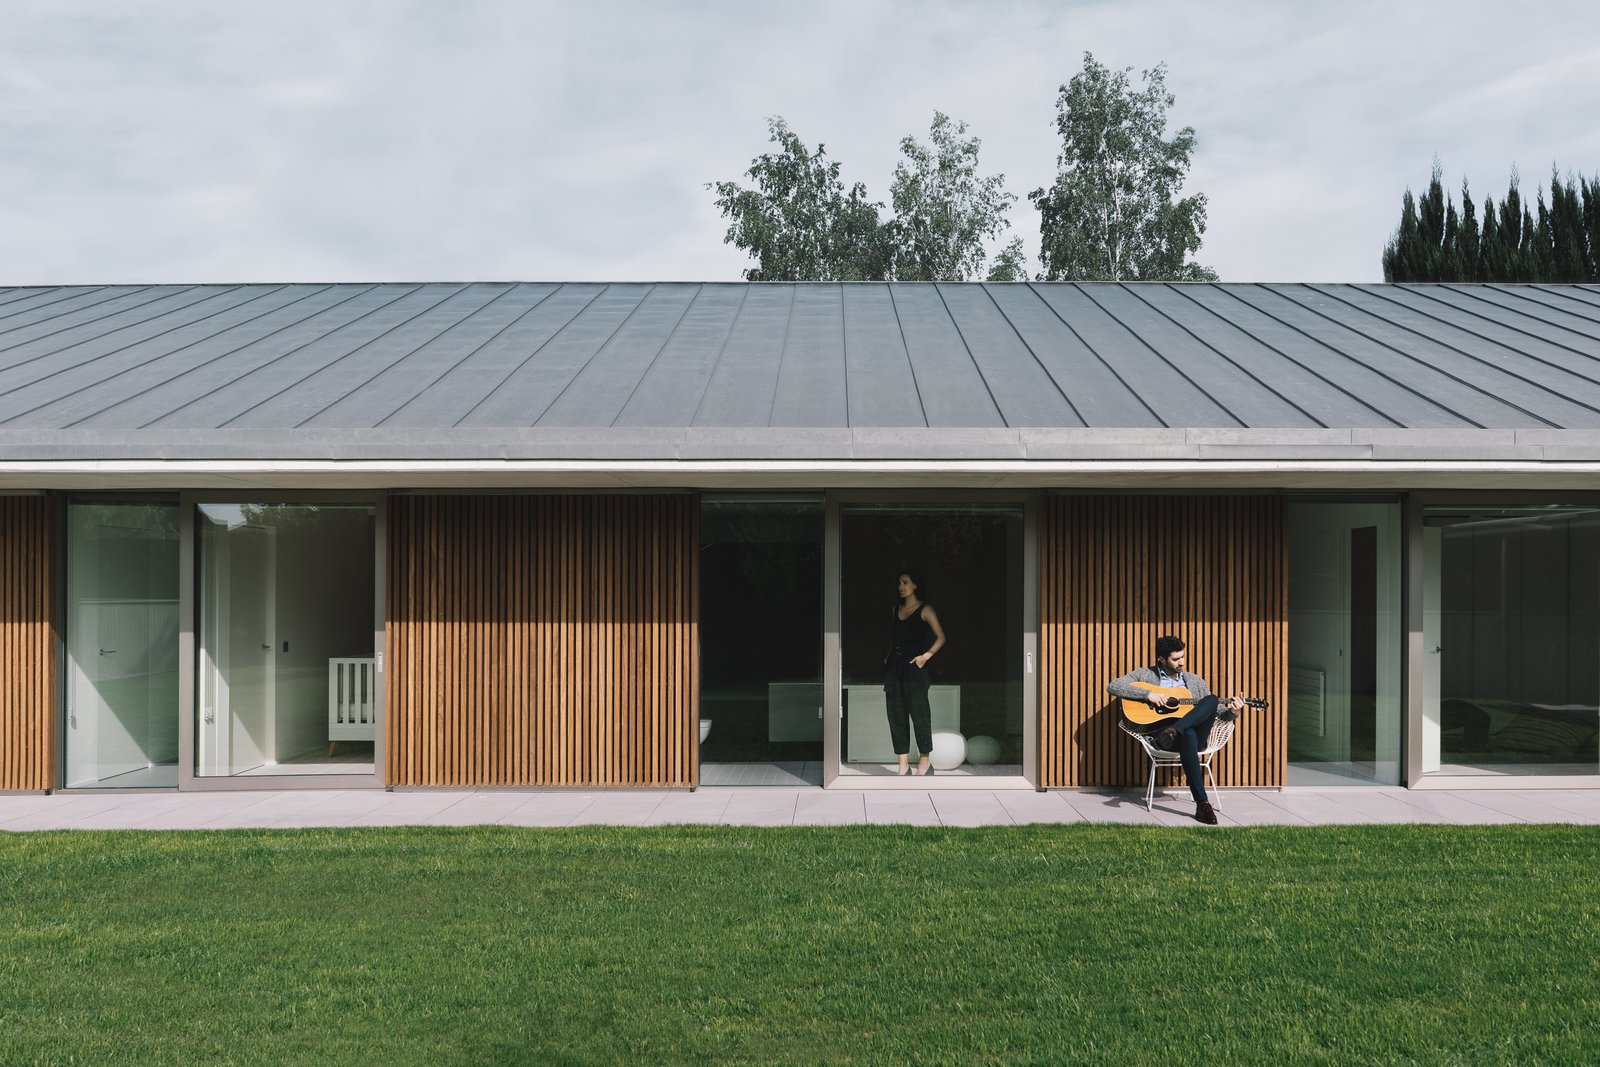 Outdoor, Front Yard, Grass, Garden, Gardens, Metal Patio, Porch, Deck, Wood Patio, Porch, Deck, and Concrete Patio, Porch, Deck  The Öcher House by MLMR Architecture Consultancy